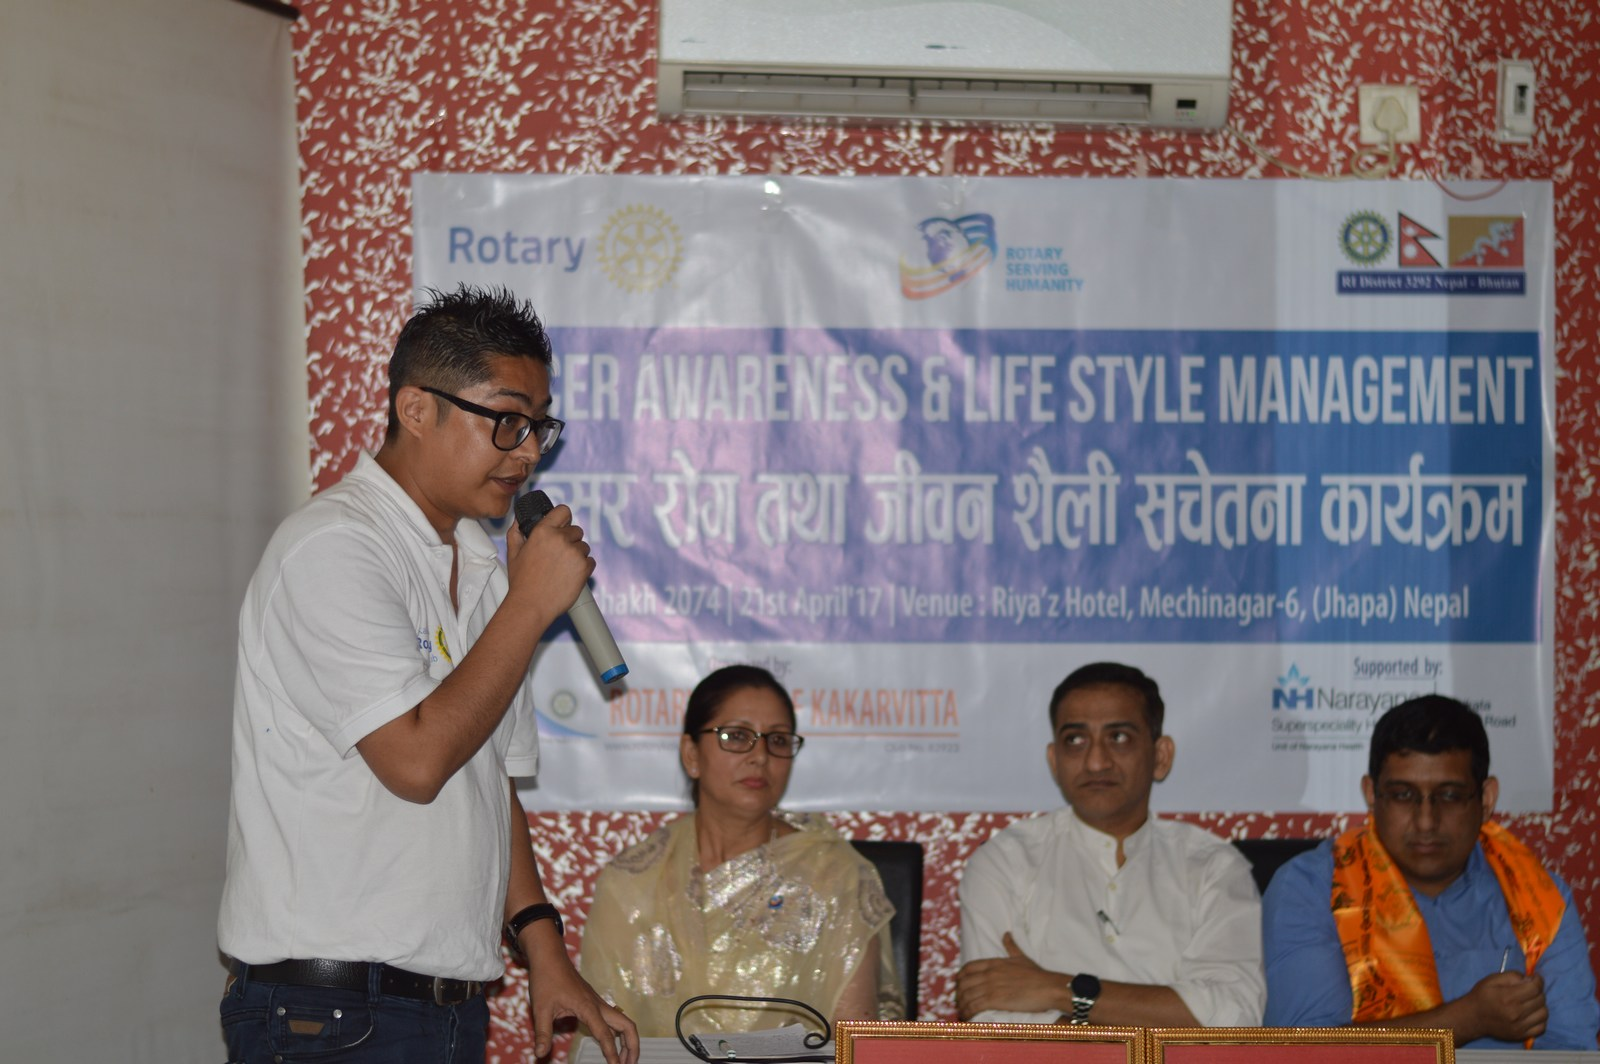 Cancer-Awareness-Life-Style-Management-Interaction-Program-2016-17-Rotary-Club-of-Kakarvitta-98